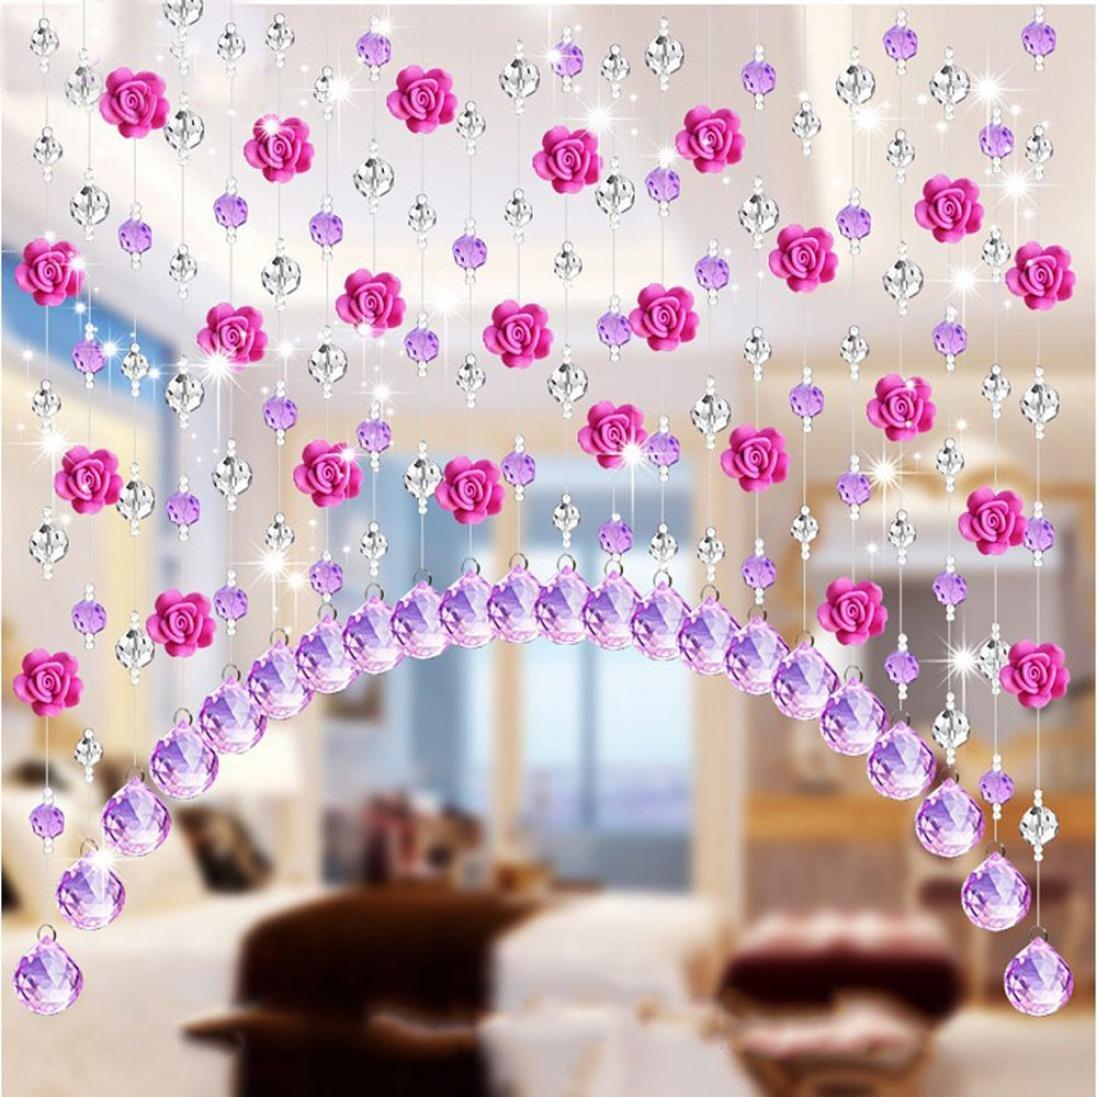 Coohole Crystal Glass Rose Bead Curtain Living Room Bedroom Window Door Wedding Home Decor (C, With Pendants)